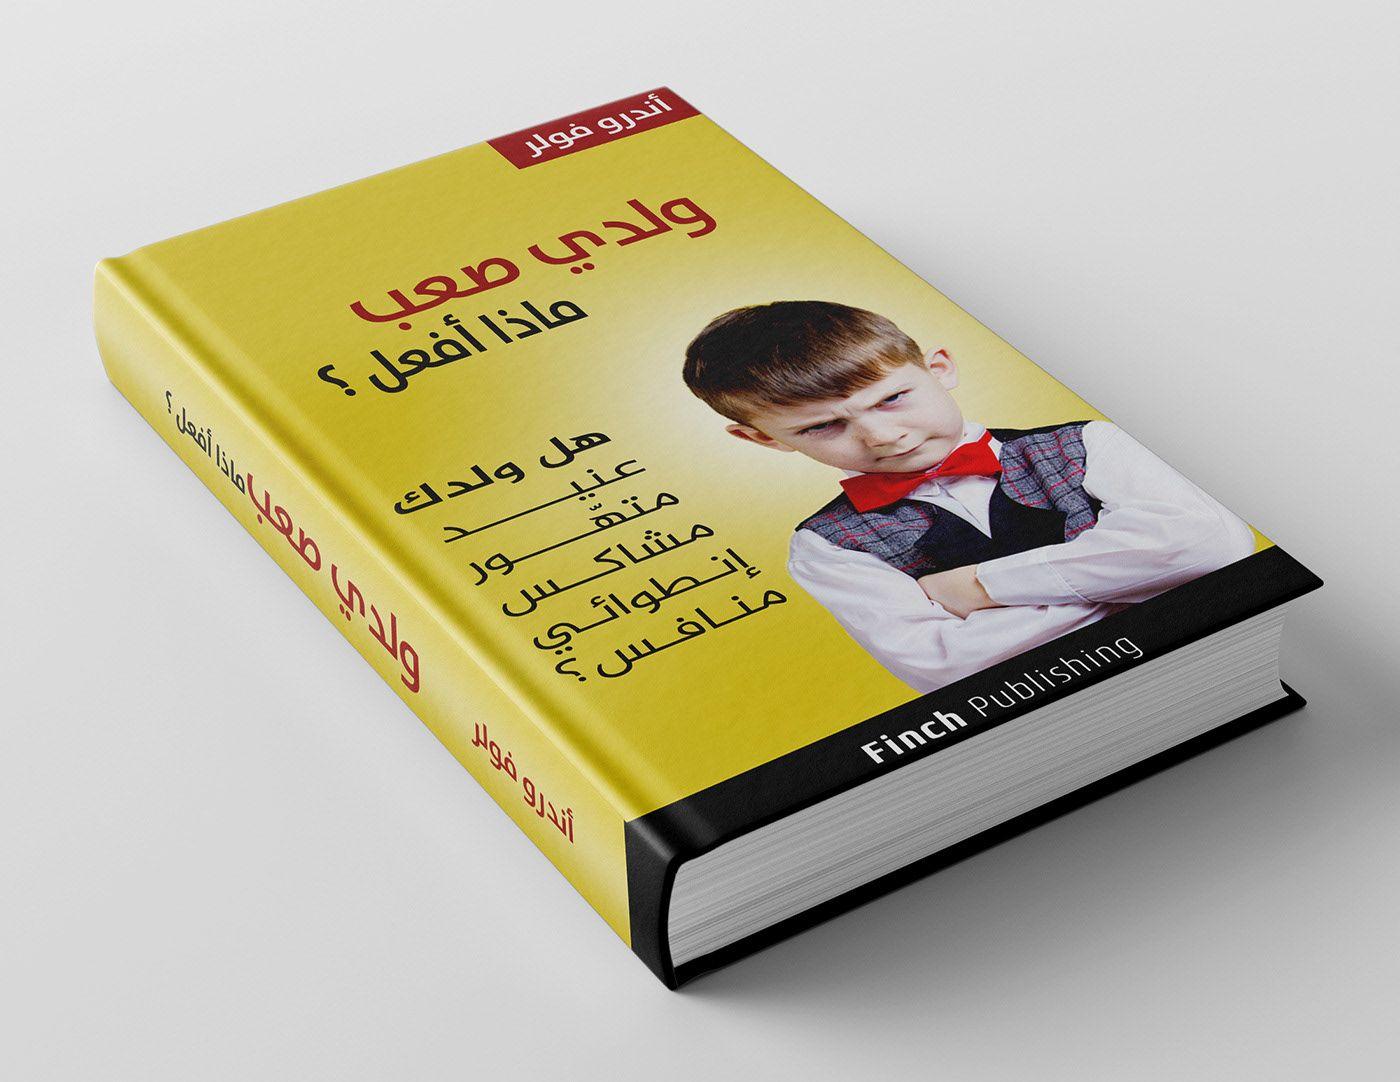 Decouvrez Mon Projet Behance موذج تصميم غلاف كتاب Https Www Behance Net Gallery 77797381 Book Cover Design Typography Book Cover Design Book Cover